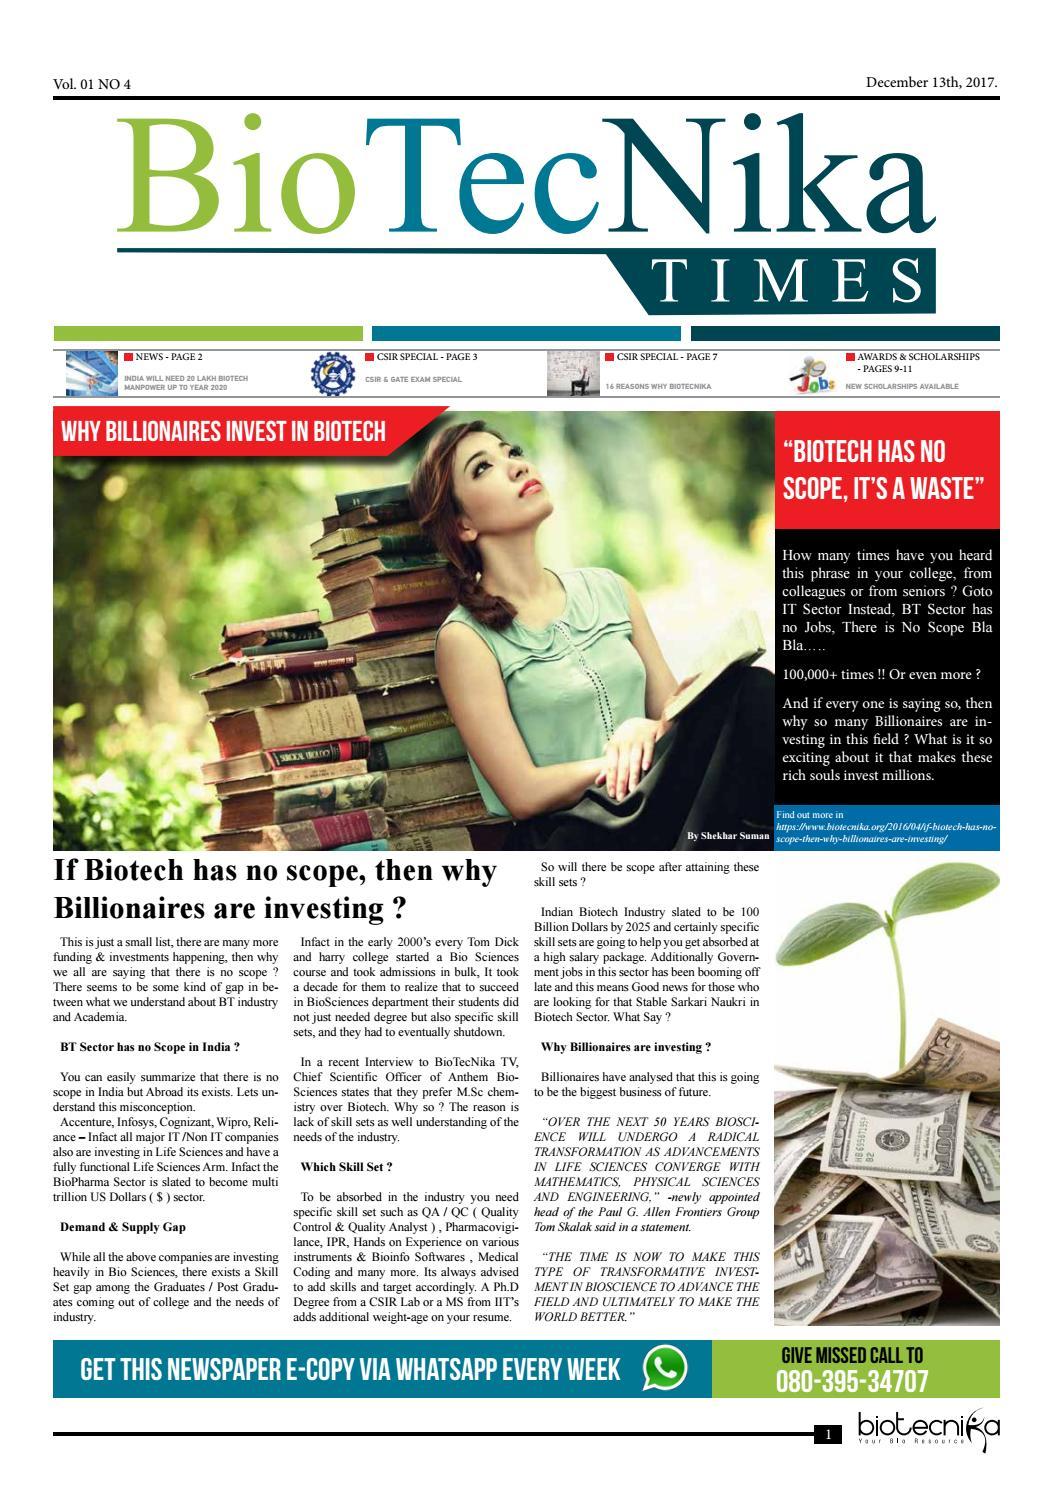 Biotecnika newspaper 13 dec 2017 by BioTecNika - issuu